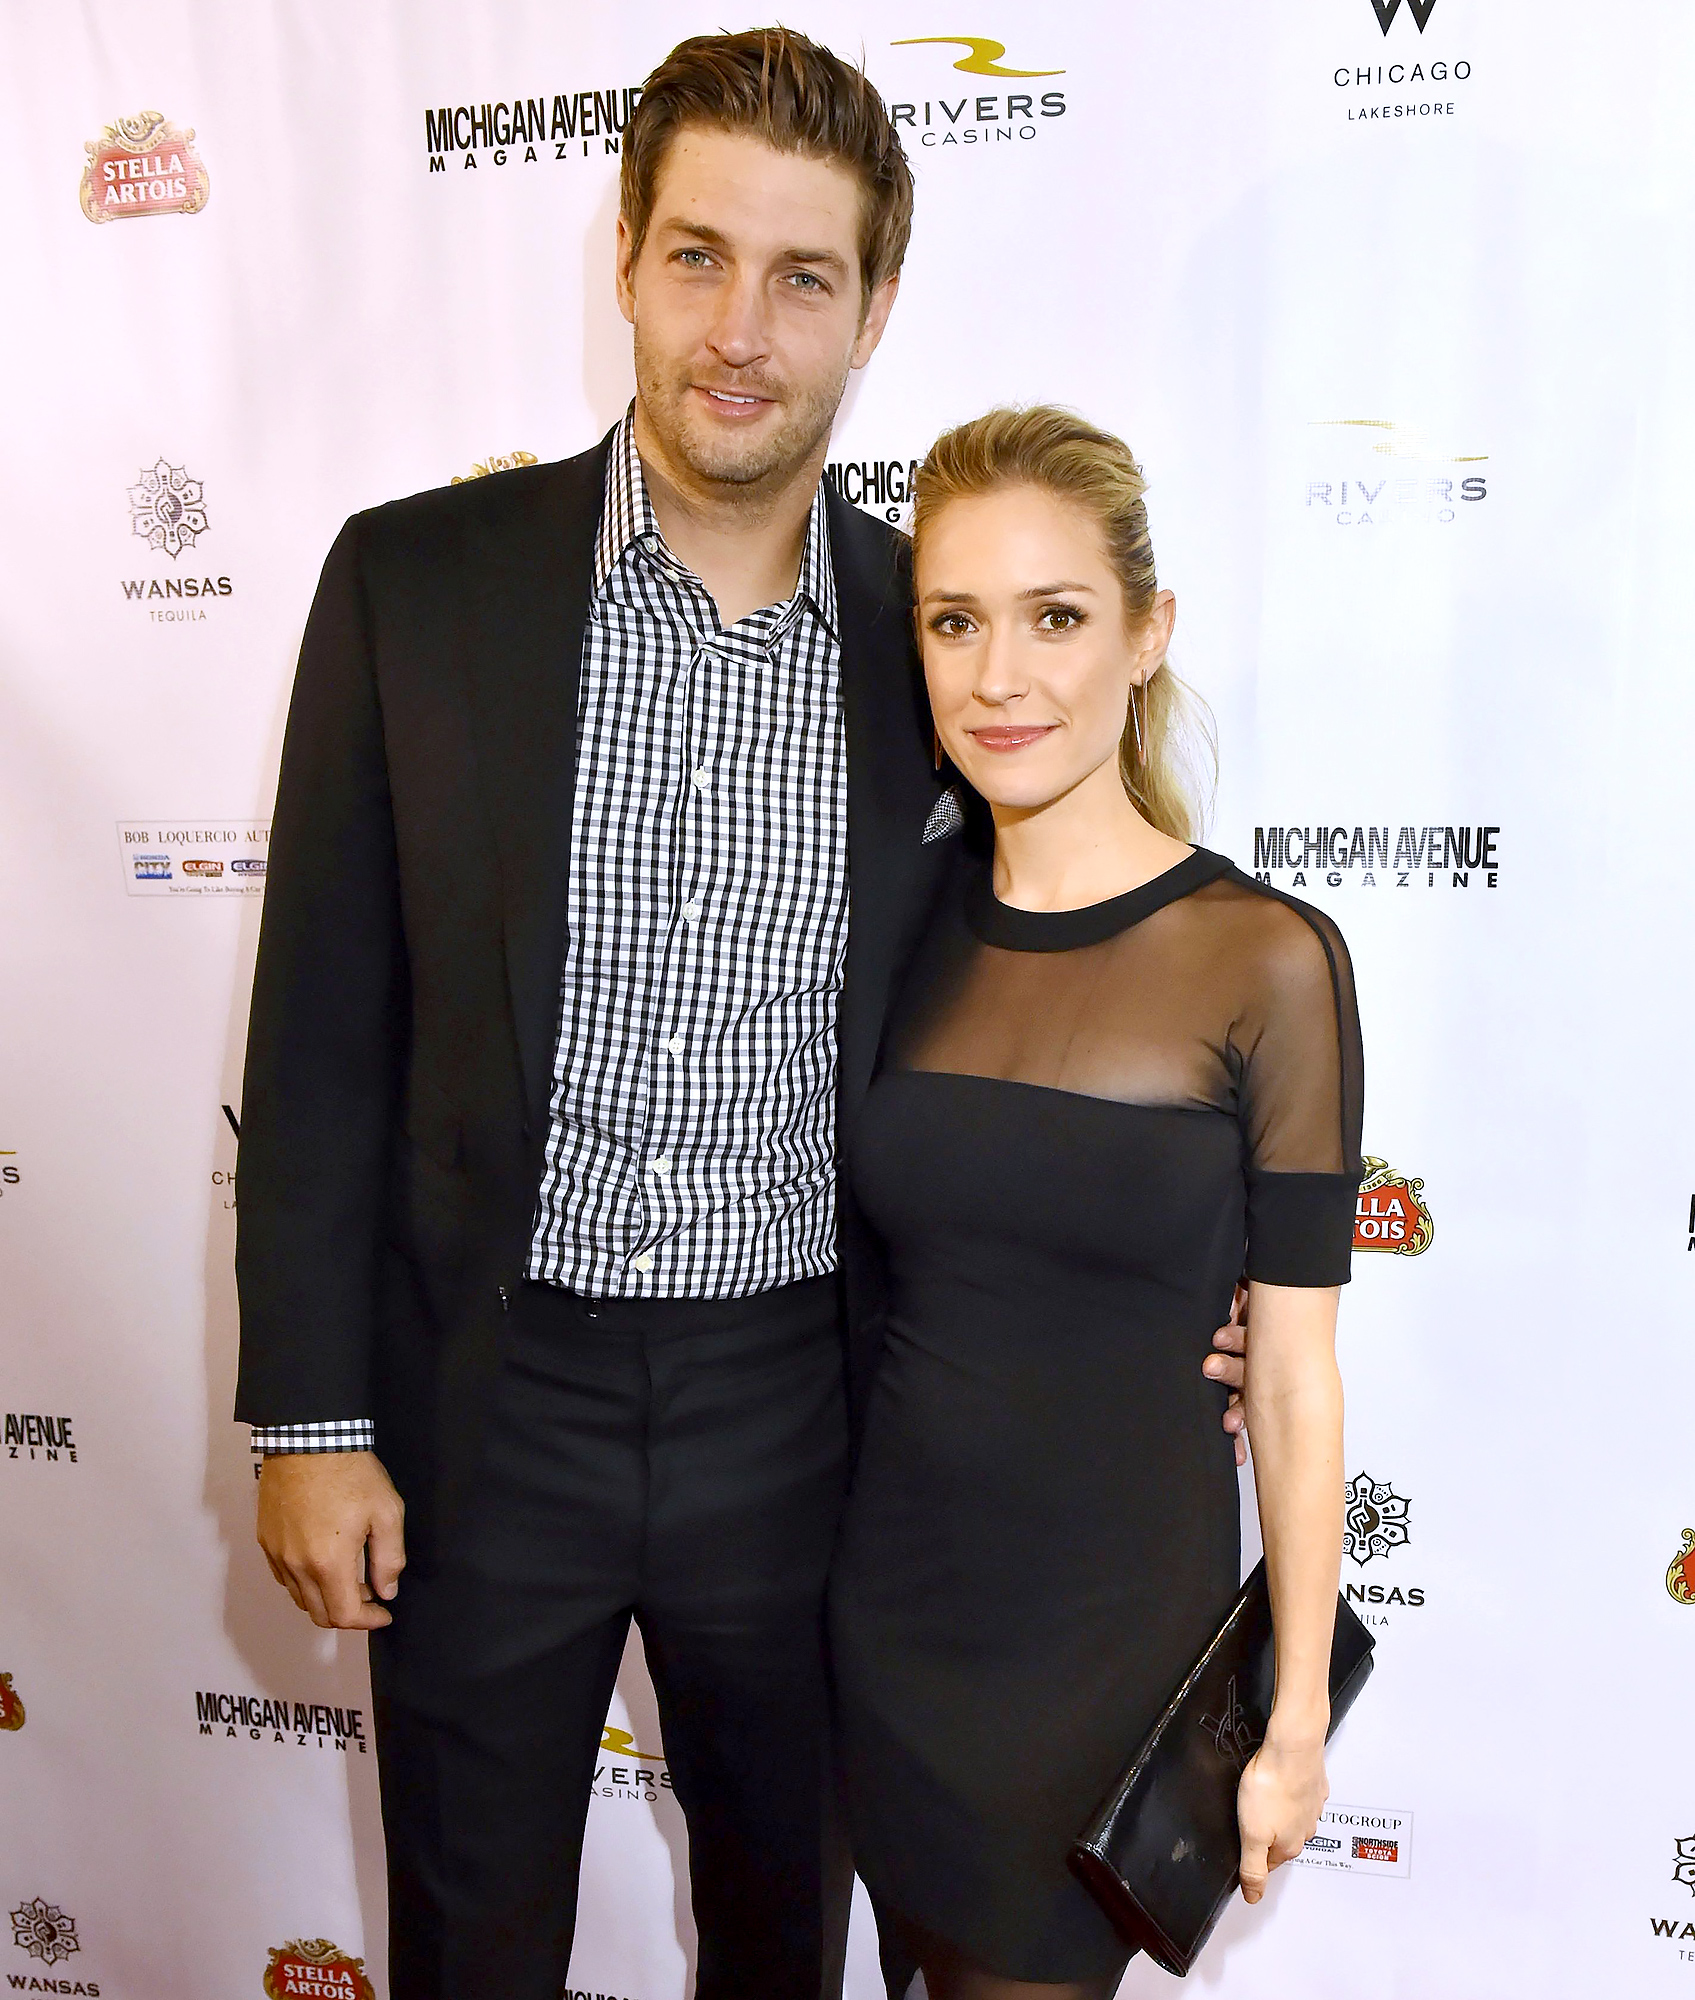 Kristin Cavallari Worries Living With Jay Cutler Will Harm Kids